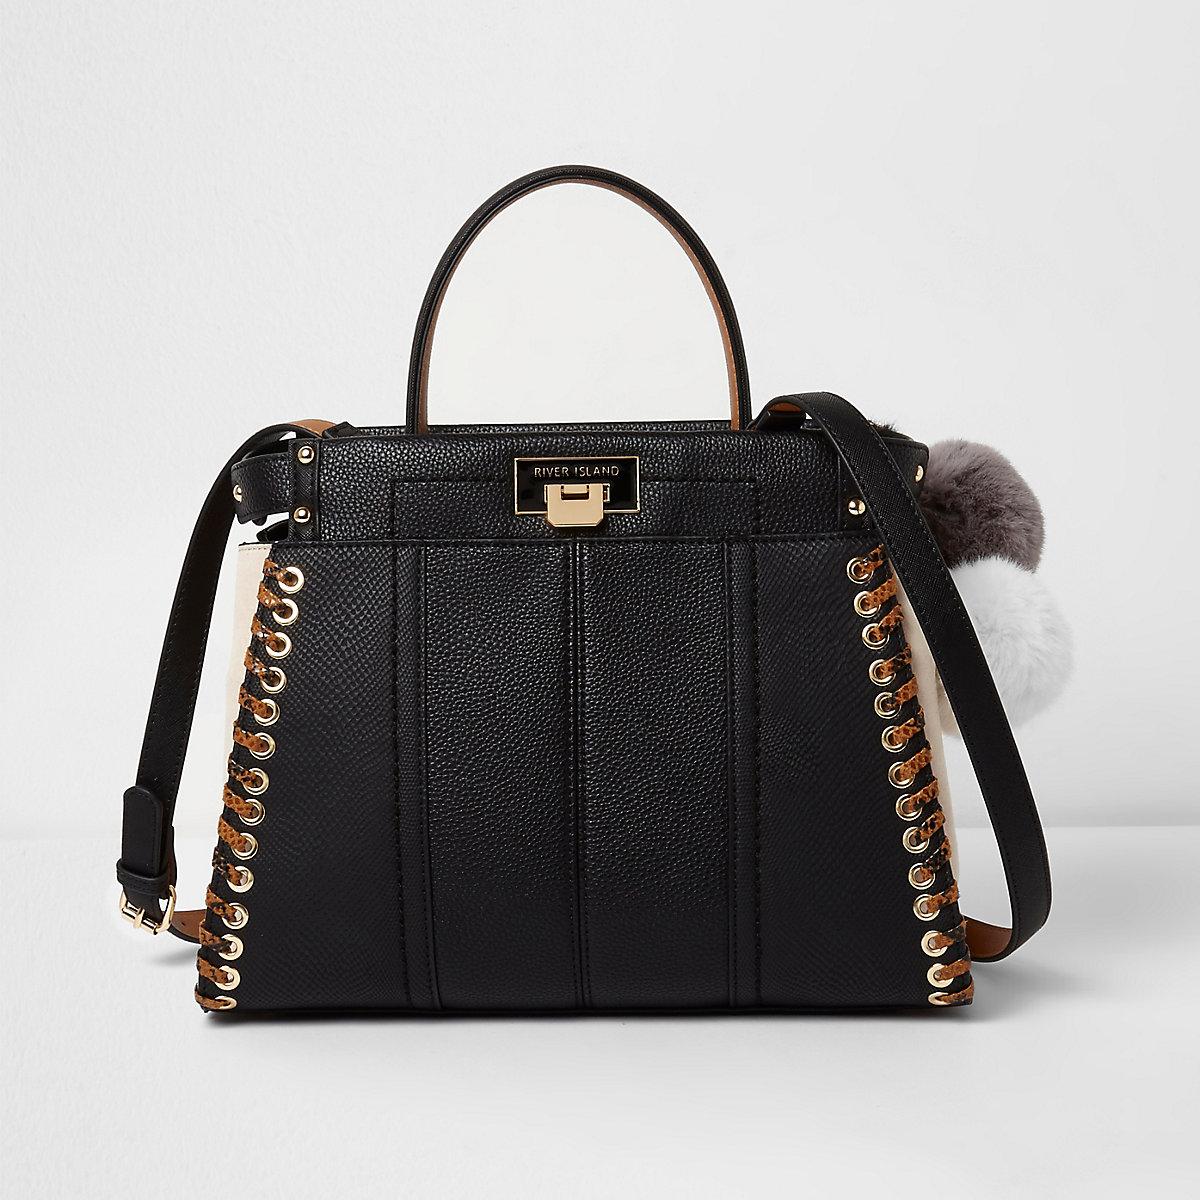 Black stitch side cross body tote bag - Shopper   Tote Bags - Bags   Purses  - women afabd3257977a